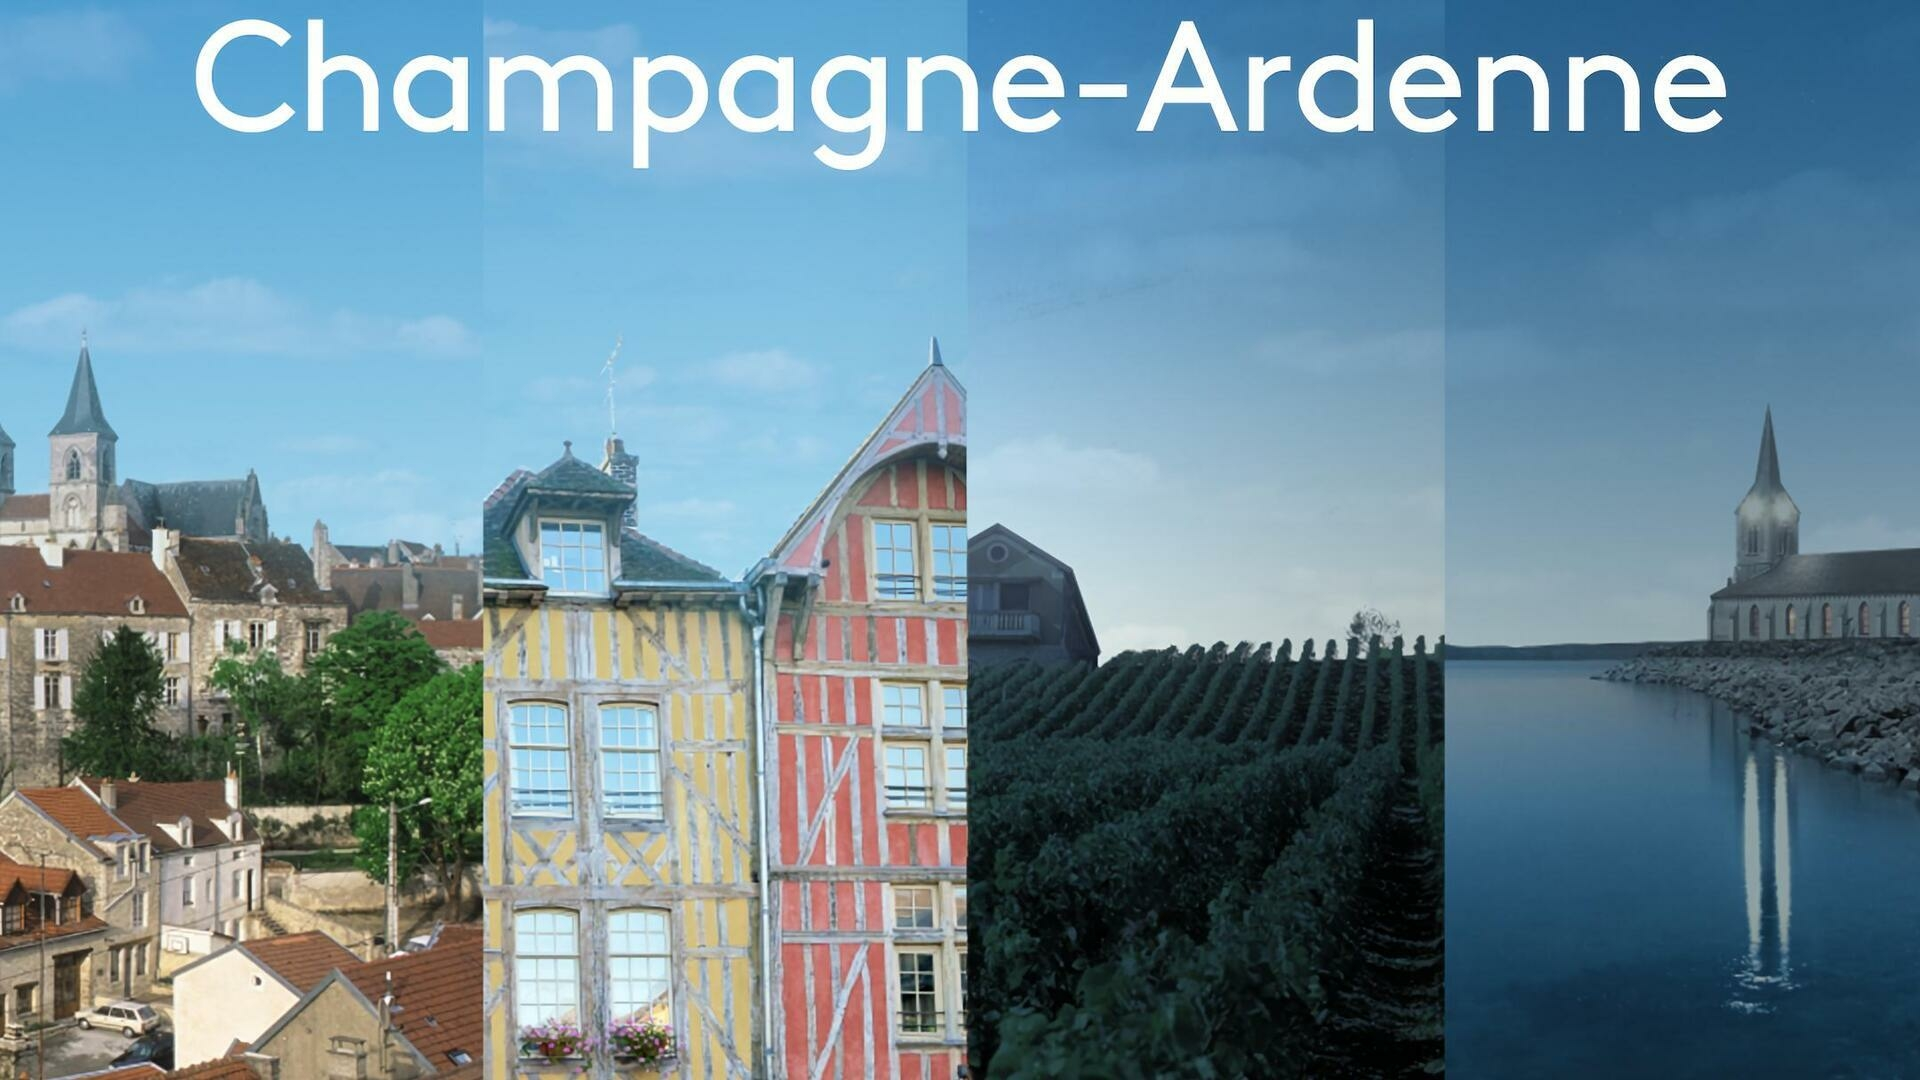 19/20 Champagne-Ardenne